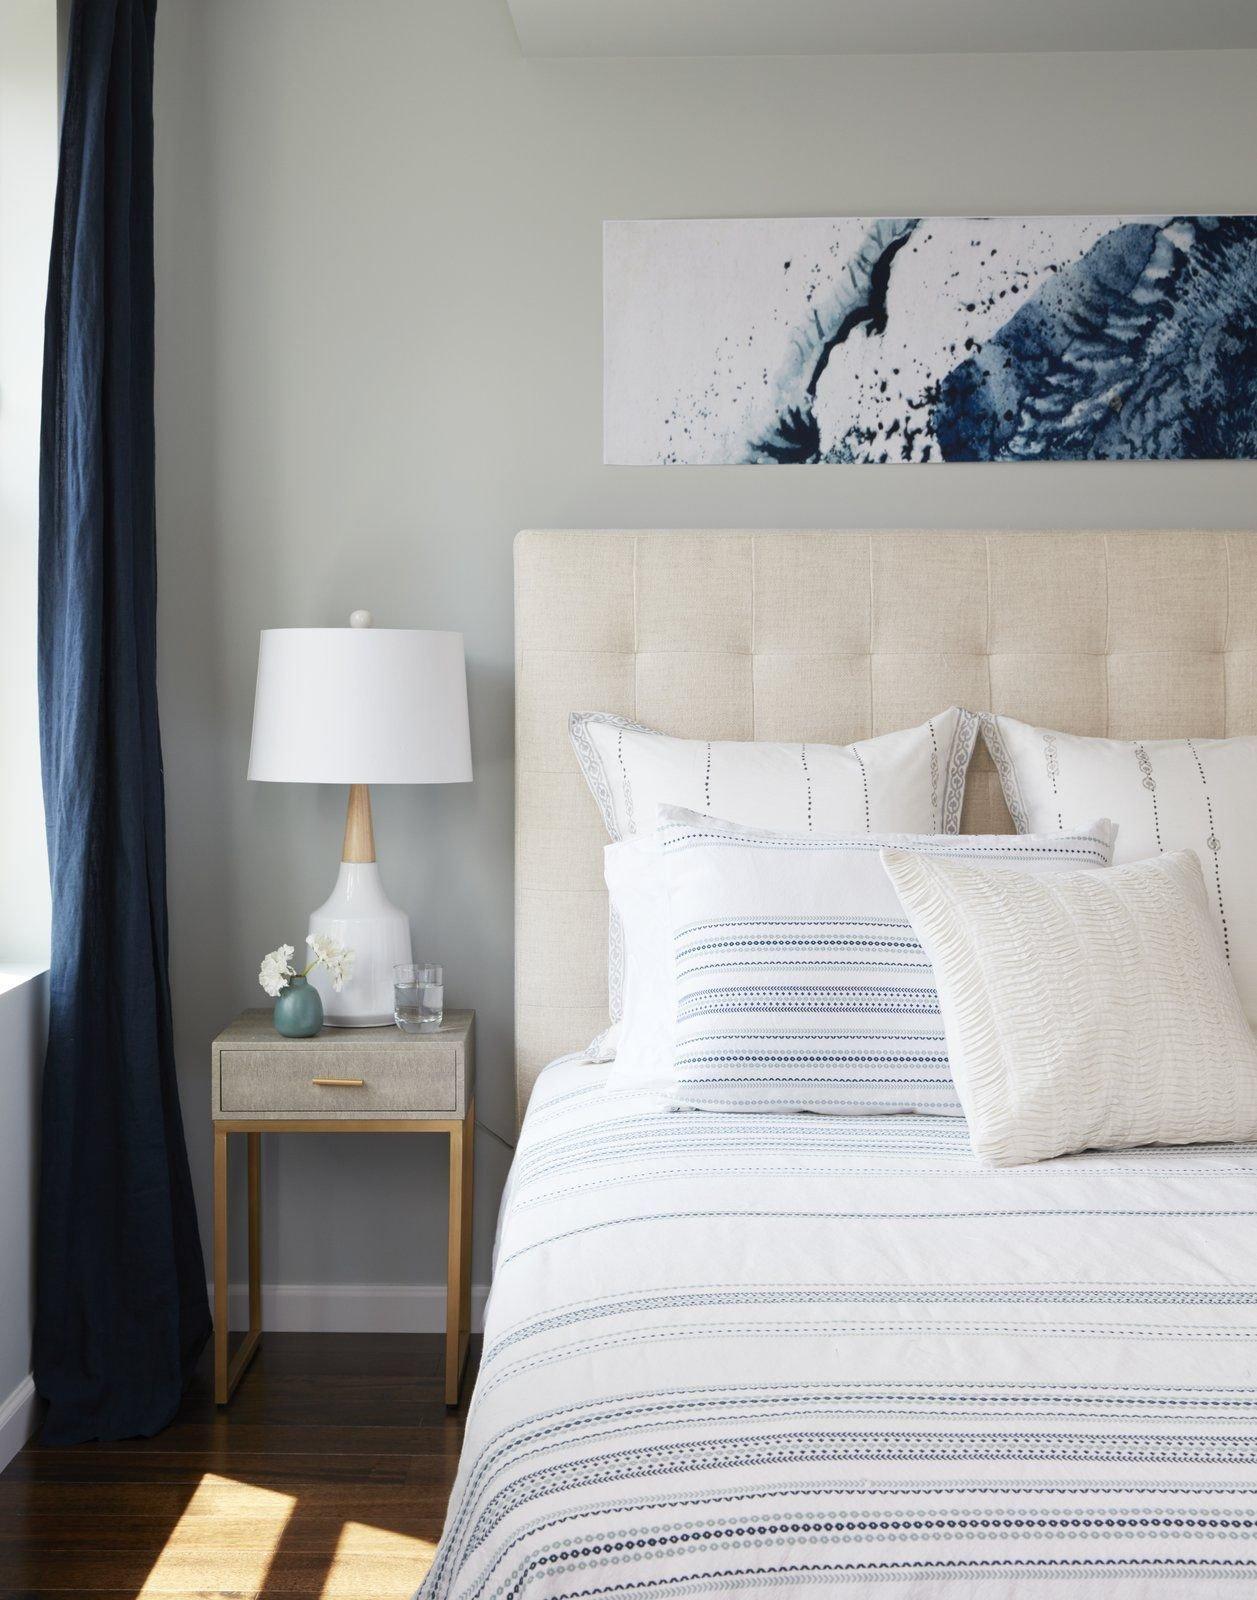 Tan and White Bedroom Beautiful 16 Spectacular Master Bedroom Hardwood Floor